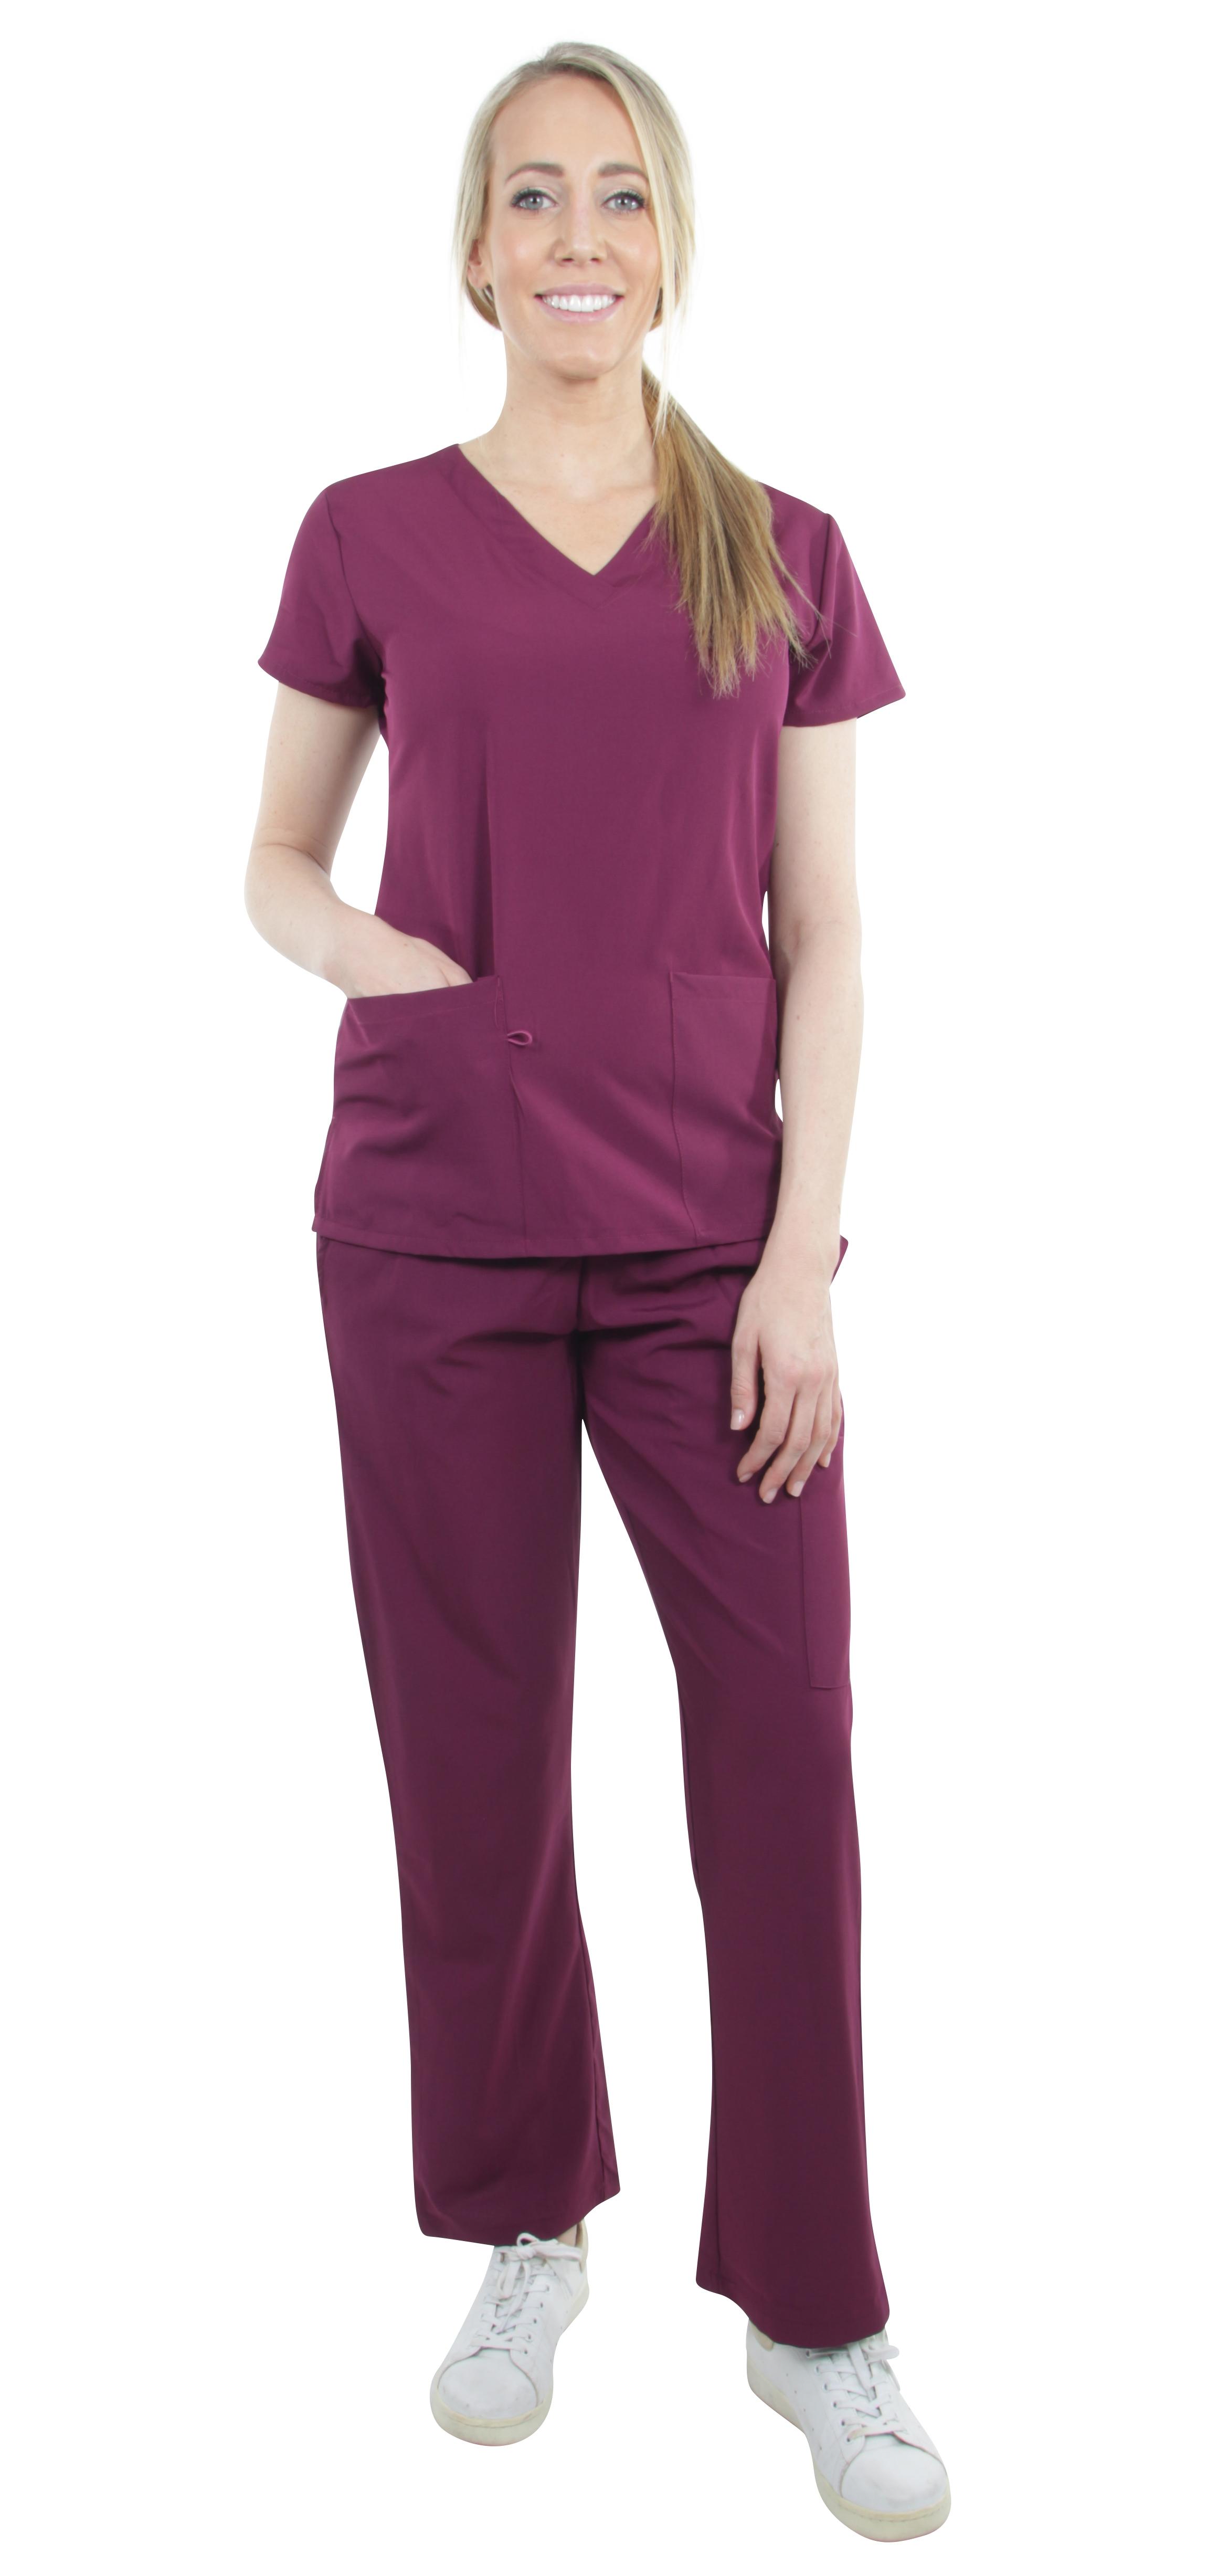 Unisex-Performance-Stretch-Medical-Uniform-Five-Pockets-V-Neck-Scrubs-Sets miniature 9